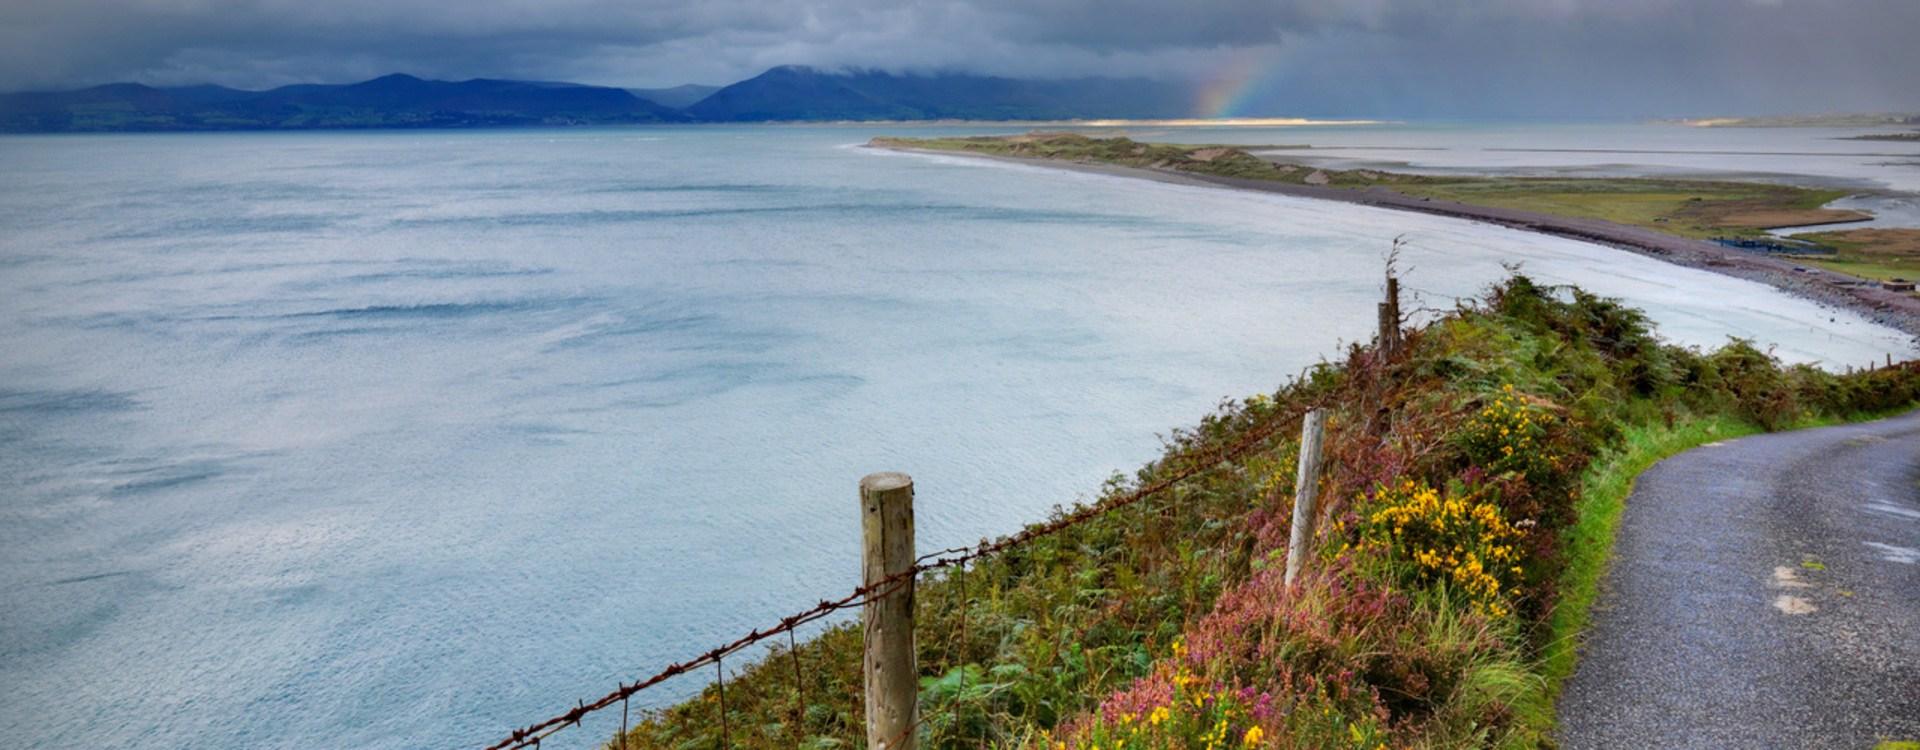 Galway e Connemara